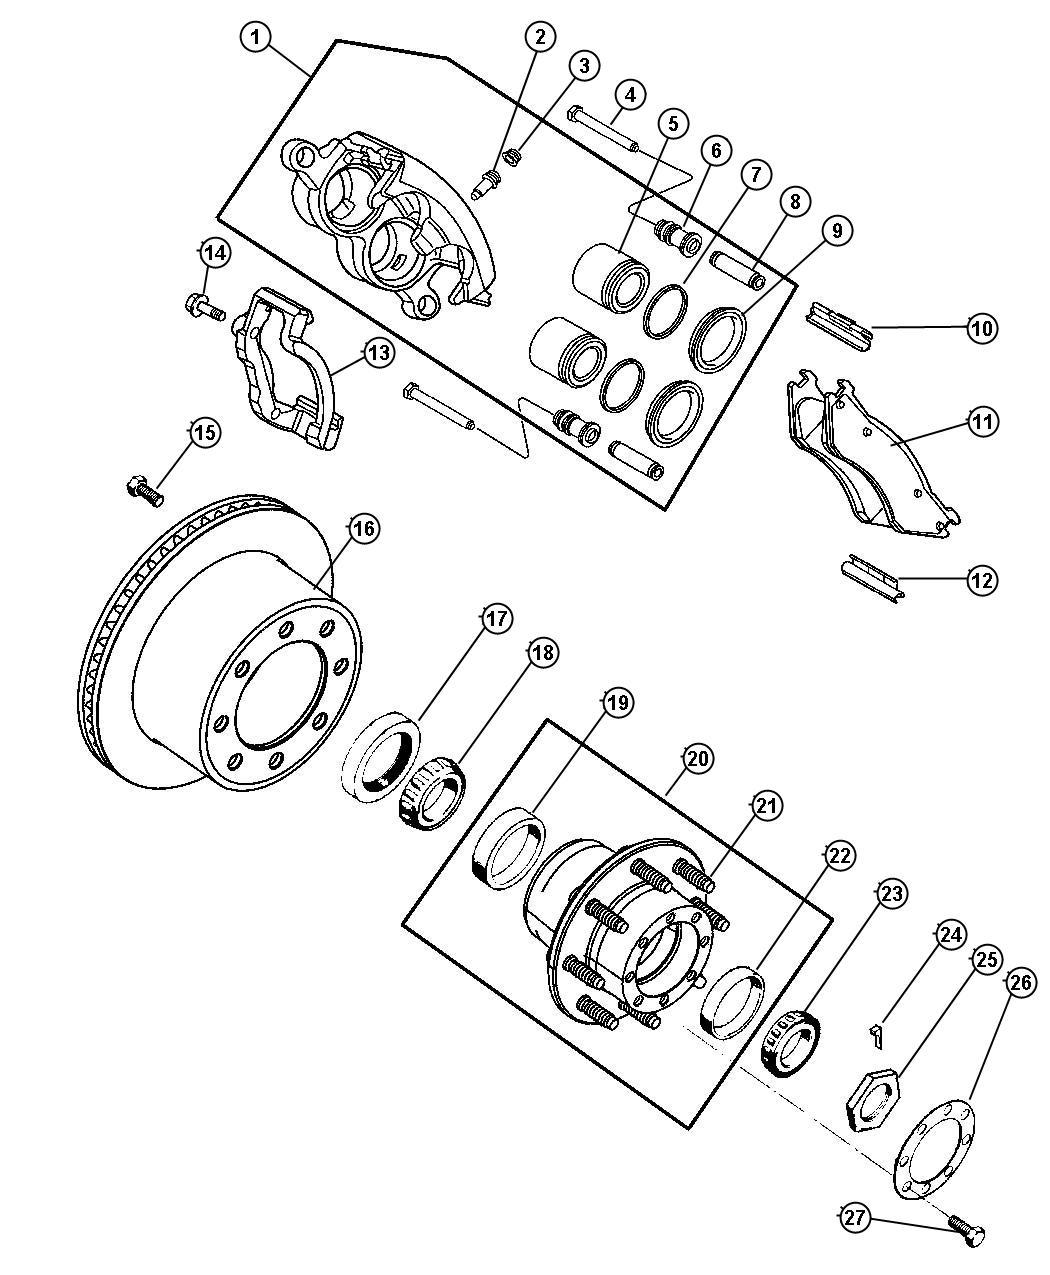 Dodge Ram 2500 Ke Caliper Parts Diagram. Dodge. Auto